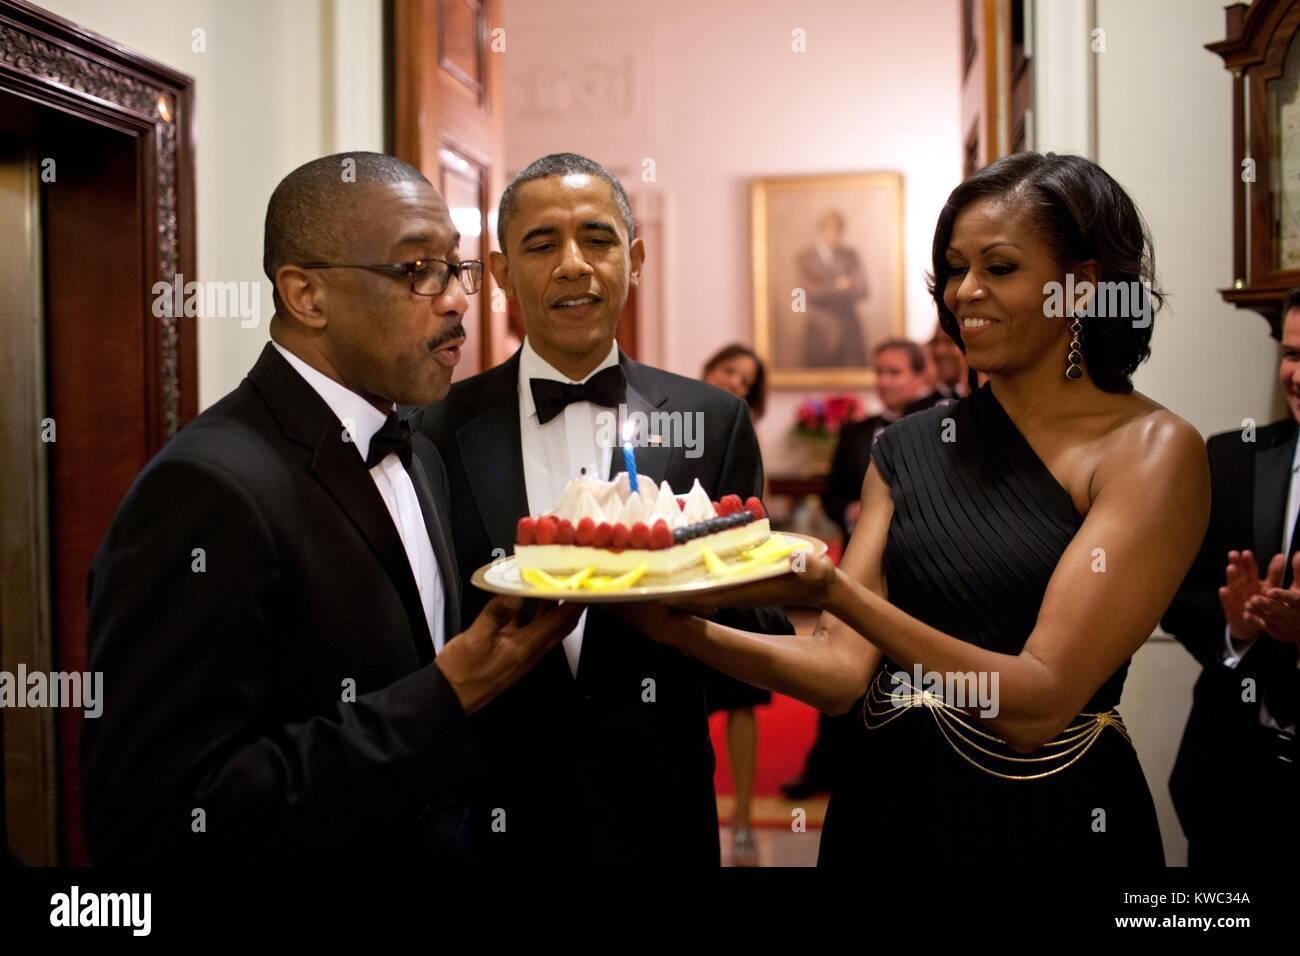 Stupendous President Barack Obama And Michelle Obama Present A Birthday Cake Funny Birthday Cards Online Inifodamsfinfo